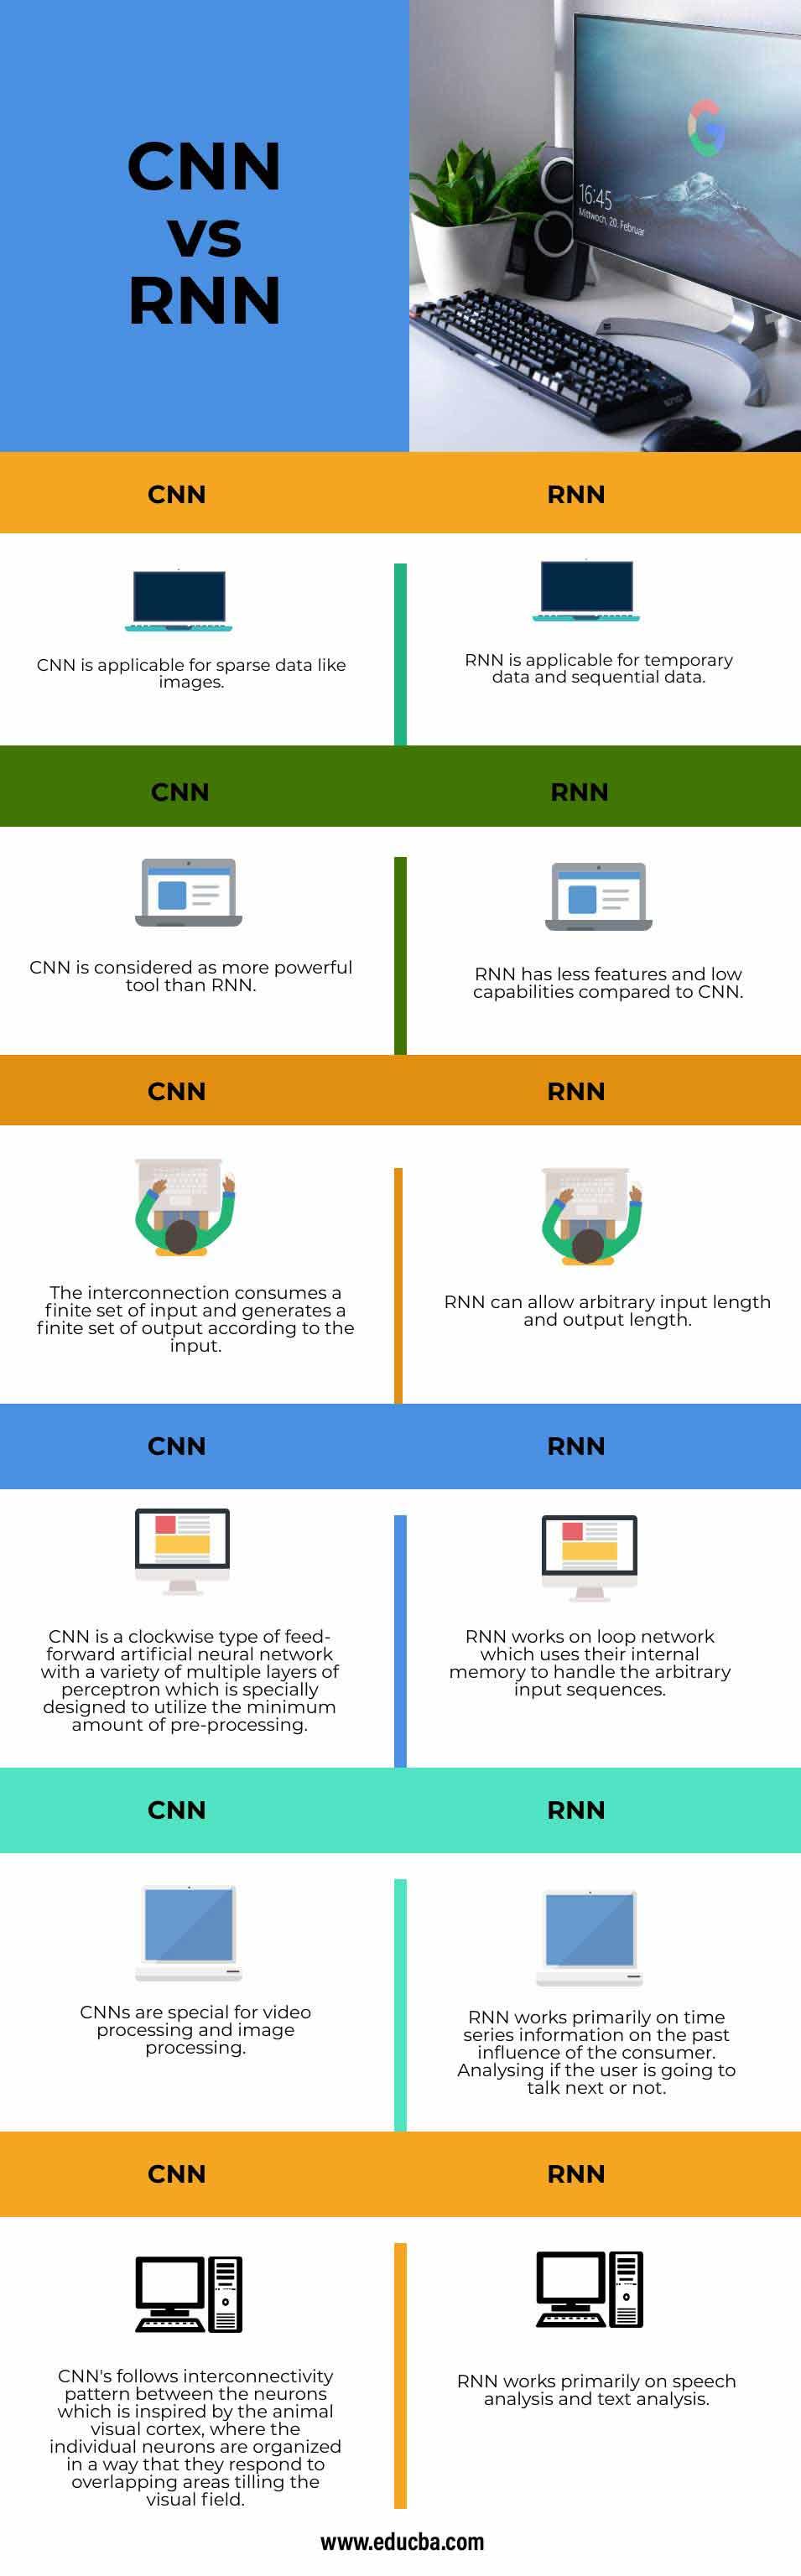 CNN vs RNN info